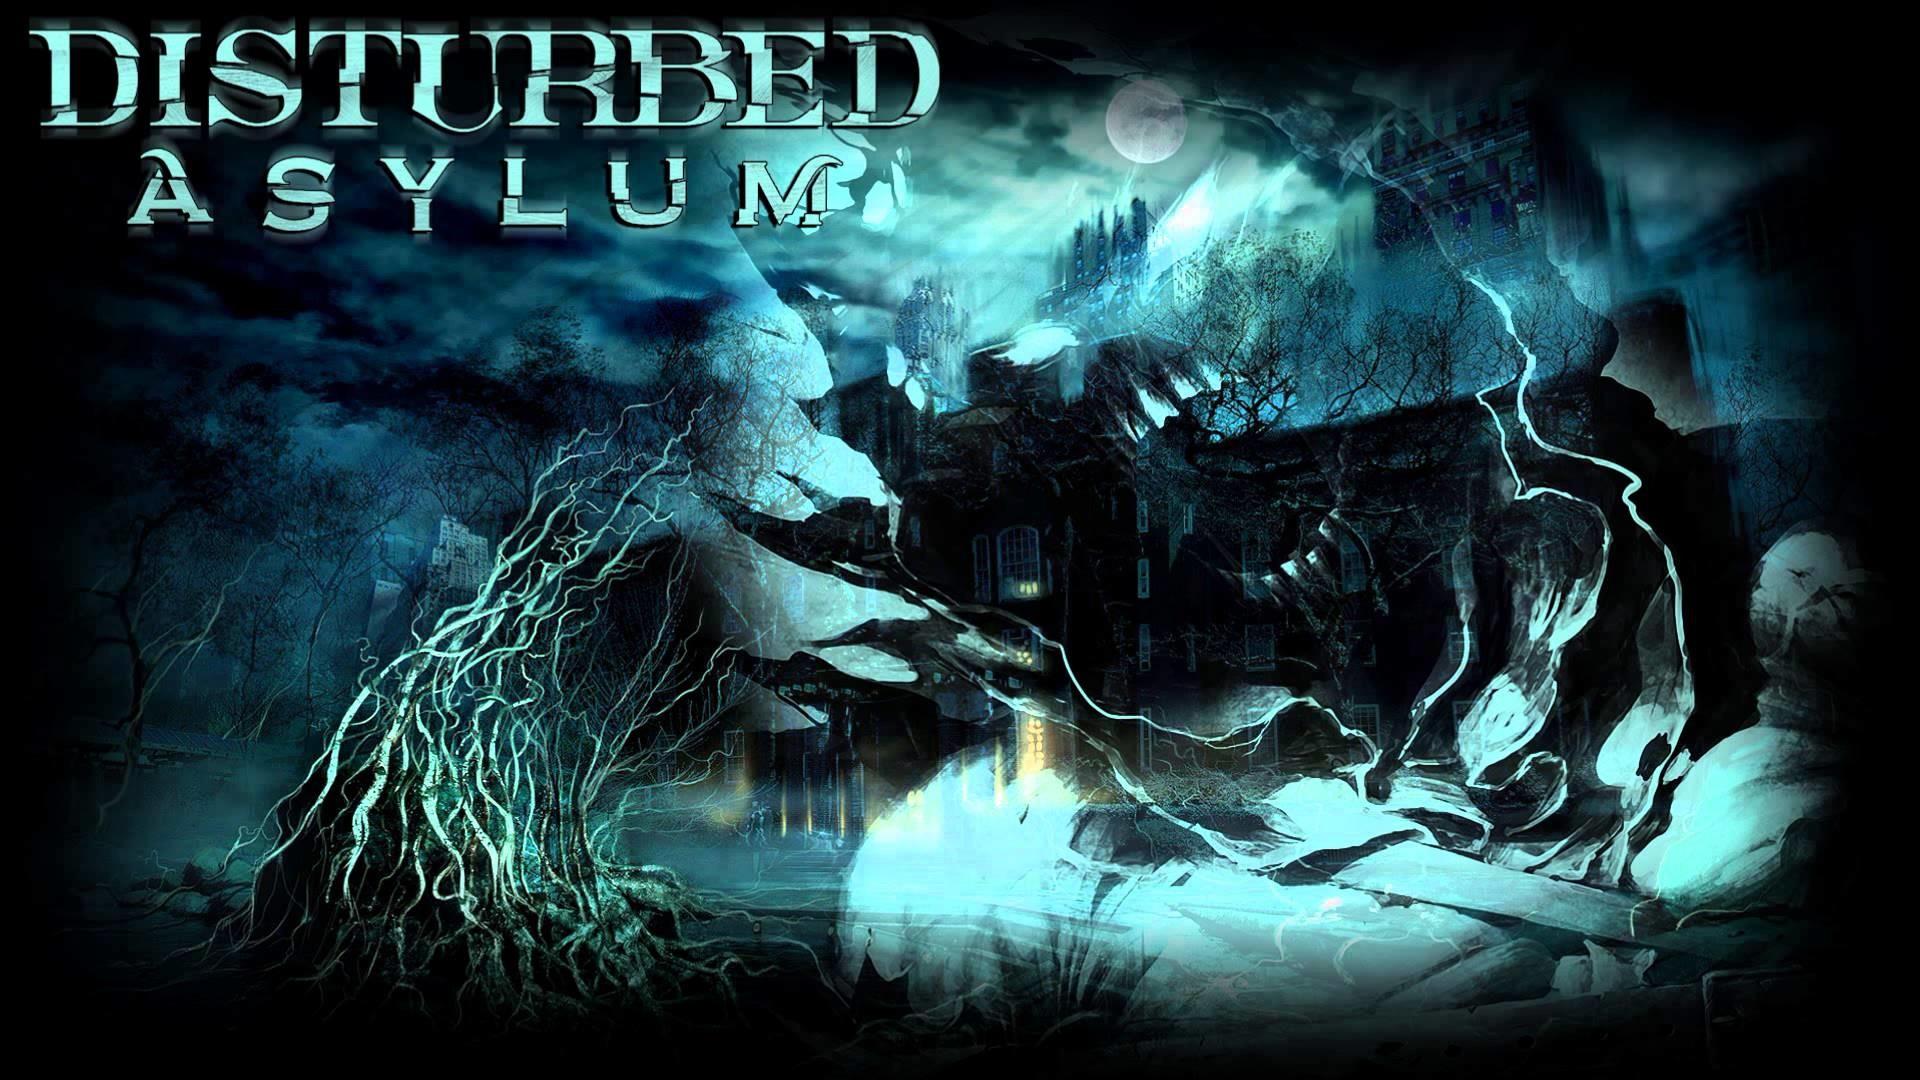 disturbed asylum wallpaper 61 images. Black Bedroom Furniture Sets. Home Design Ideas